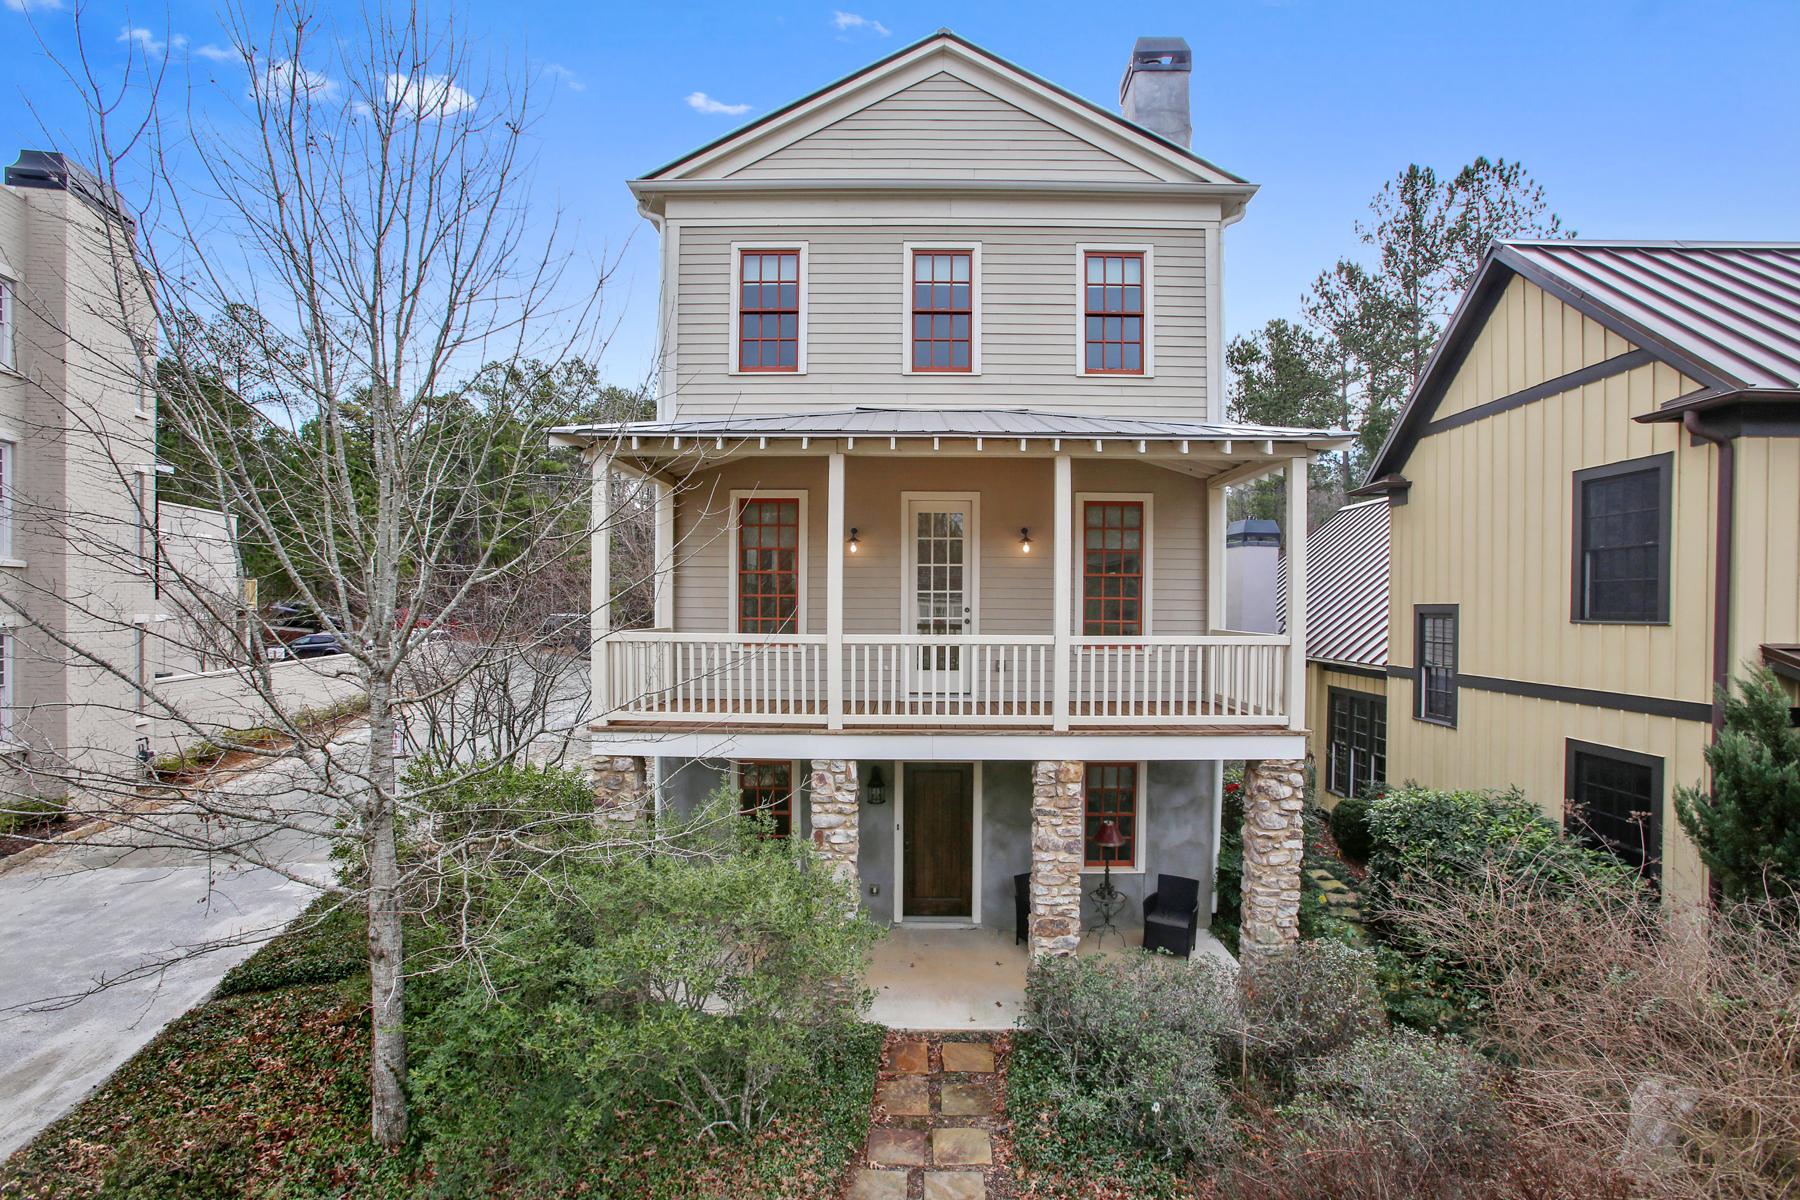 Maison unifamiliale pour l Vente à Inviting Serenbe Cottage in the Highly Sought-After Selborne Area 9134 Selborne Lane Chattahoochee Hills, Georgia, 30268 États-Unis